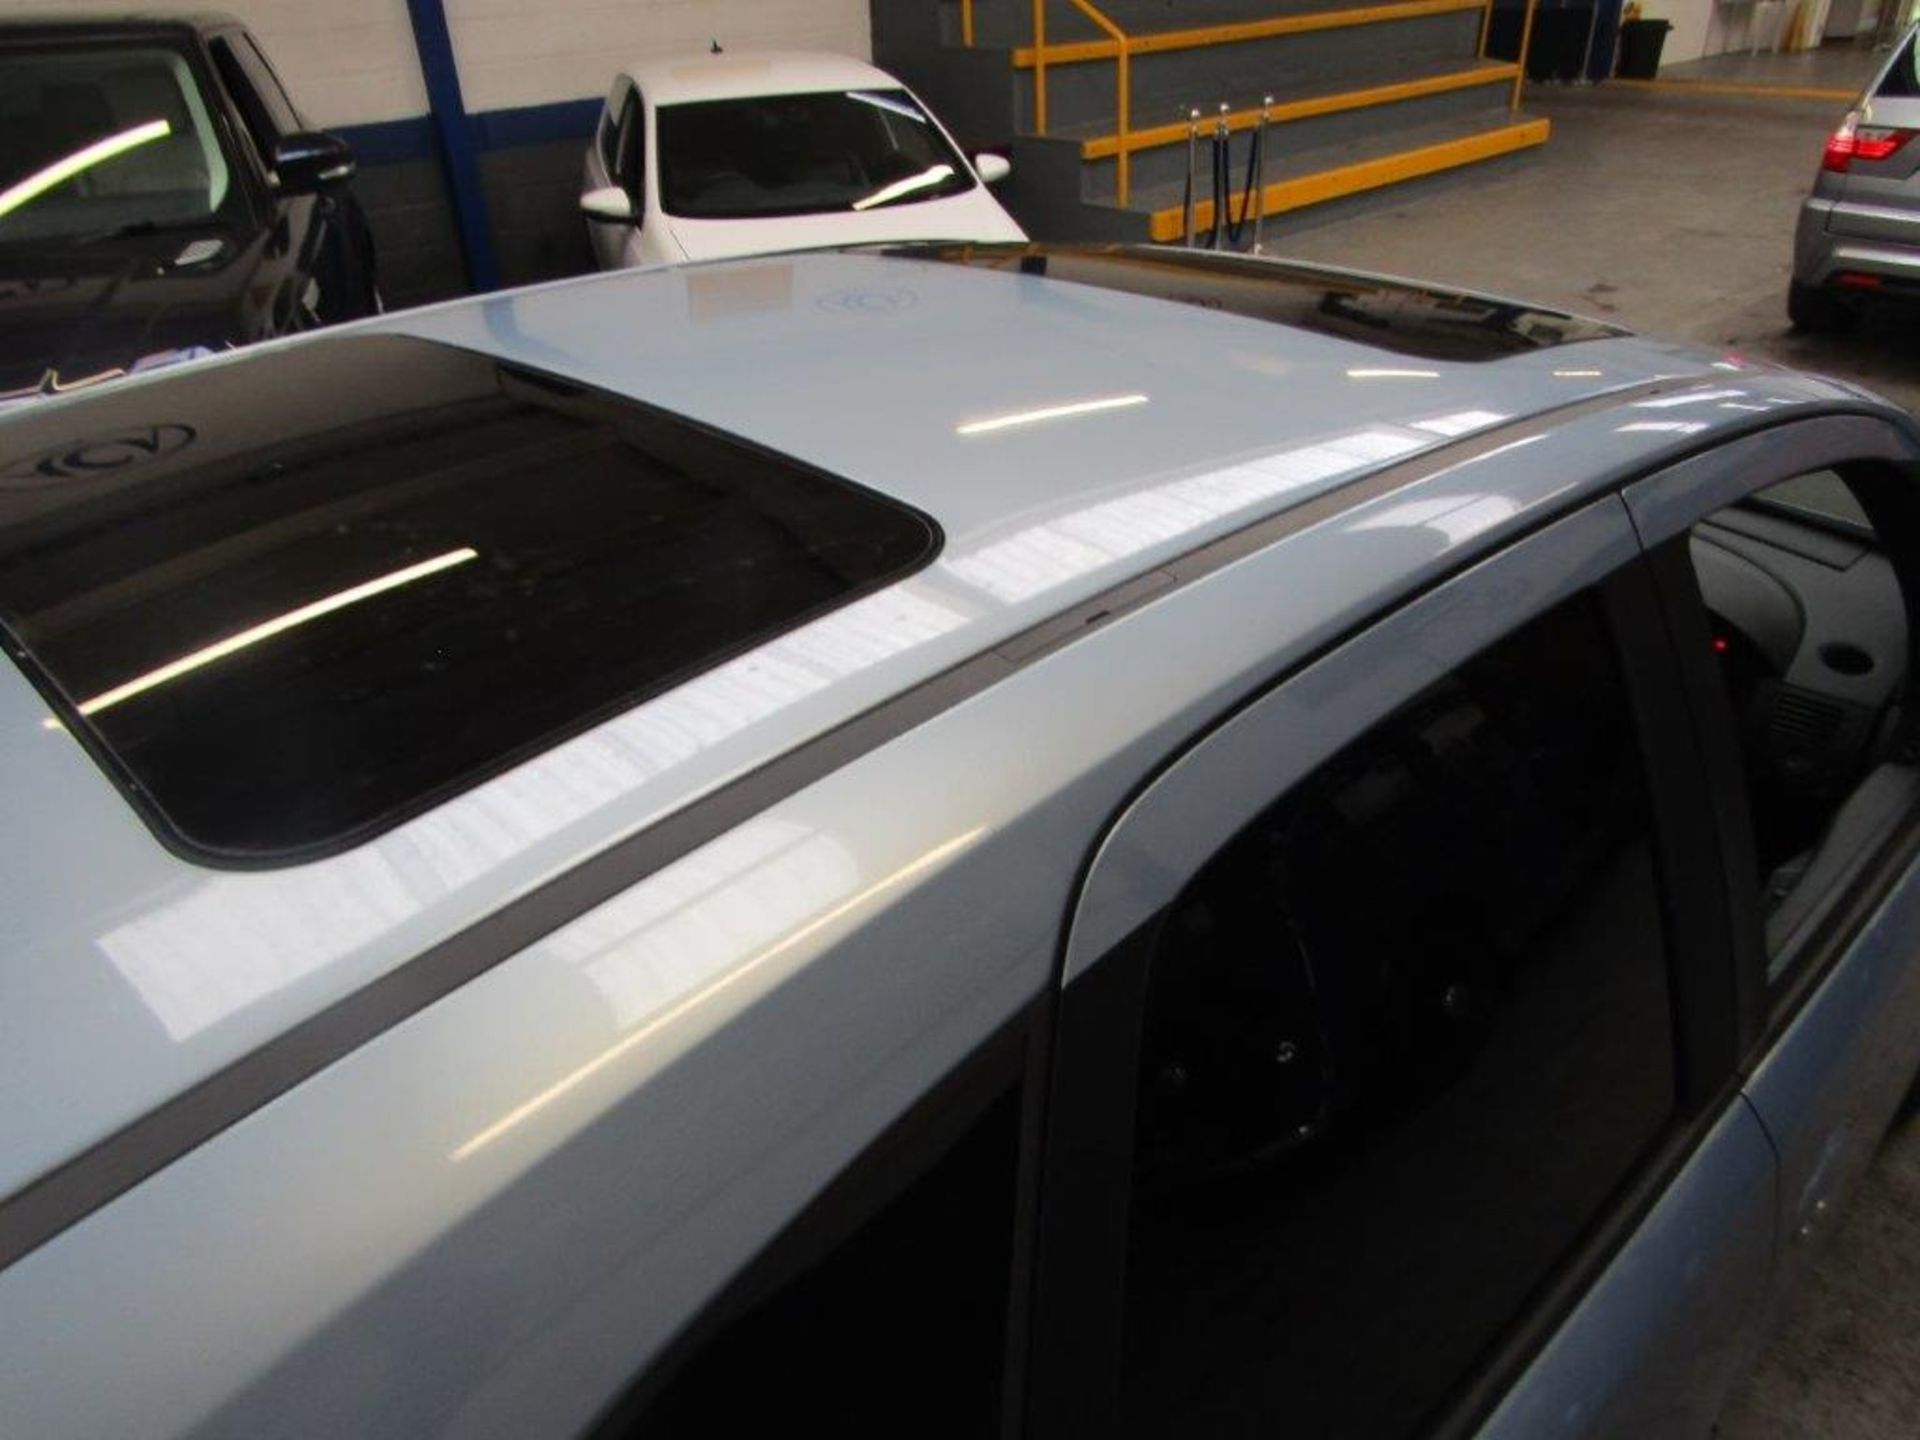 58 08 Vauxhall Meriva Design - Image 15 of 25